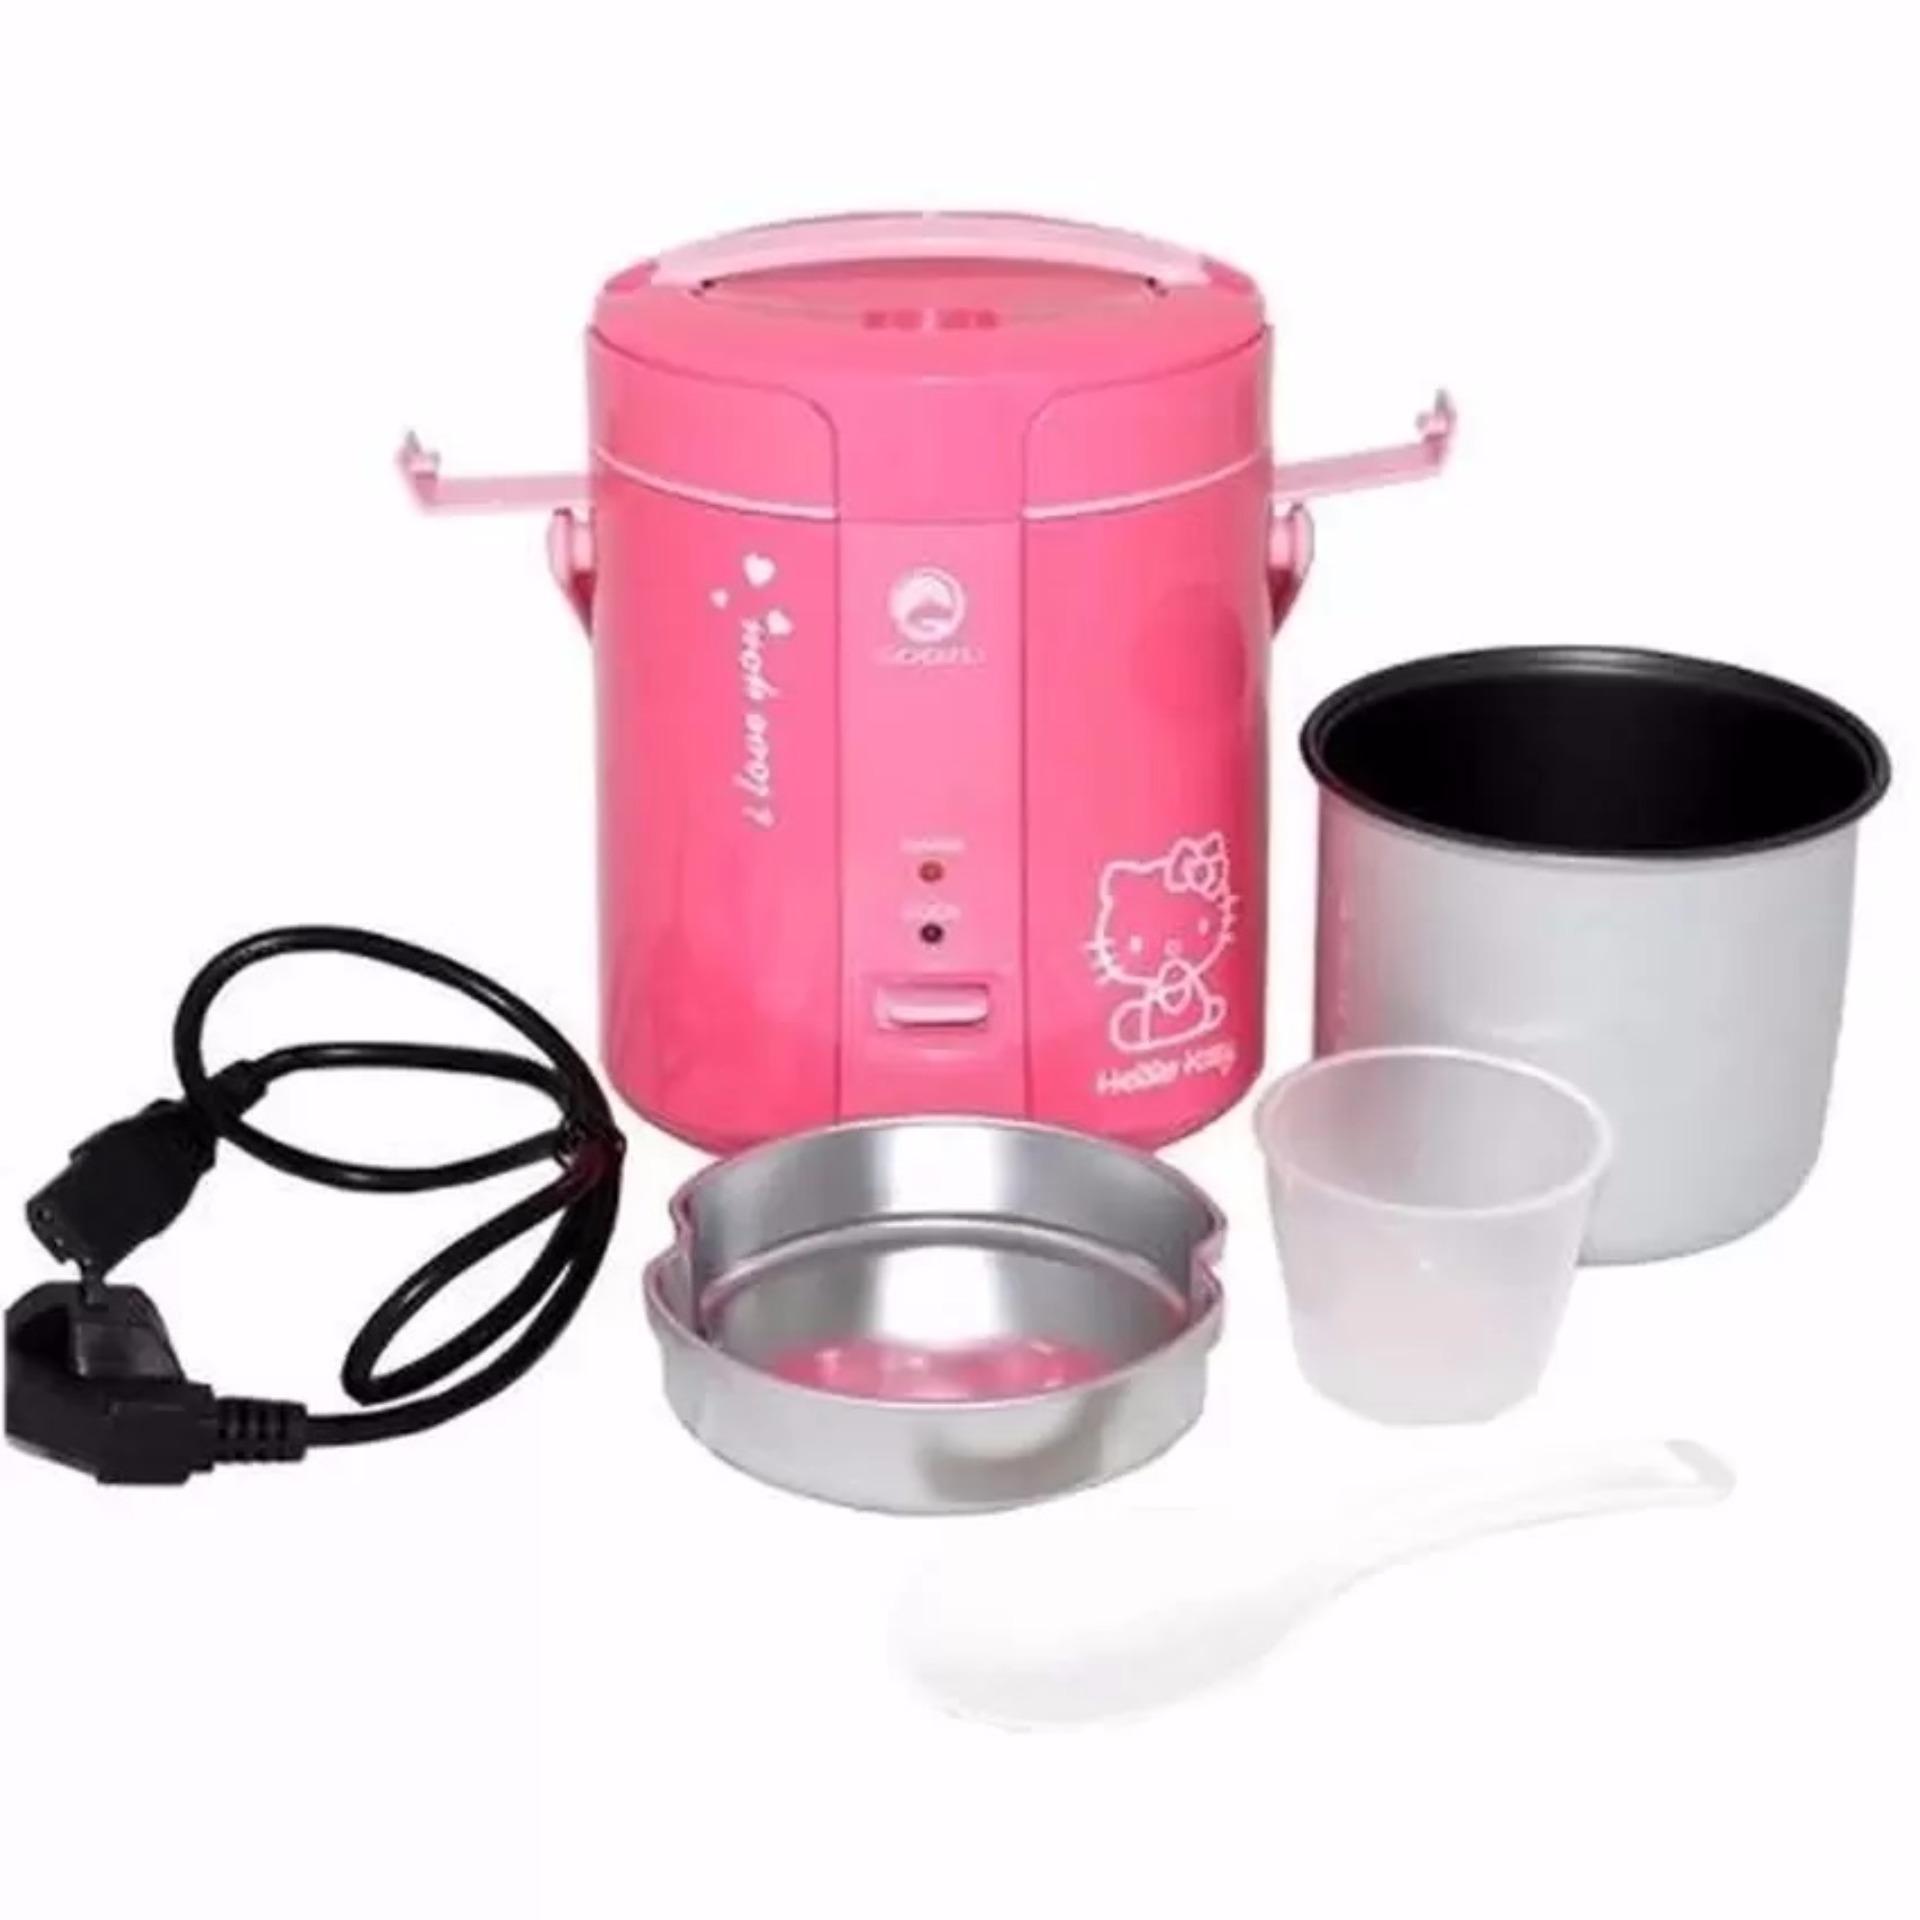 Flash Sale Godzu Rice Cooker Mini Travel GRC168PK - Pink